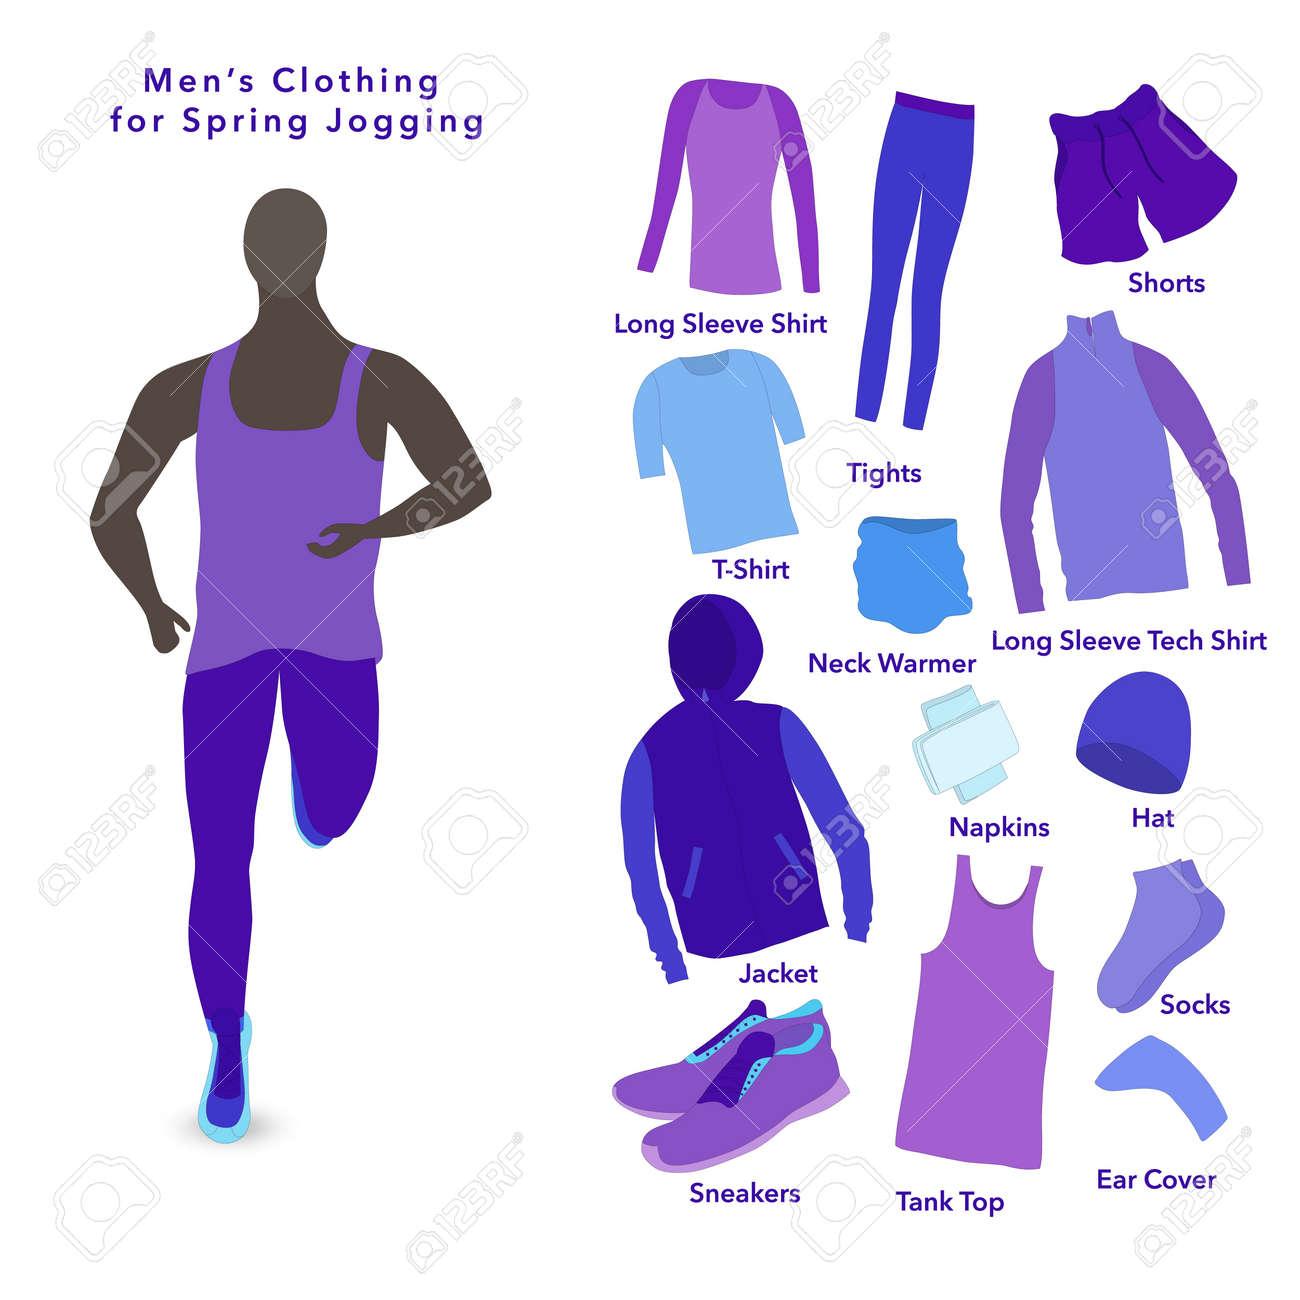 Set of Clothes for a Spring Jogging for men. - 166734464